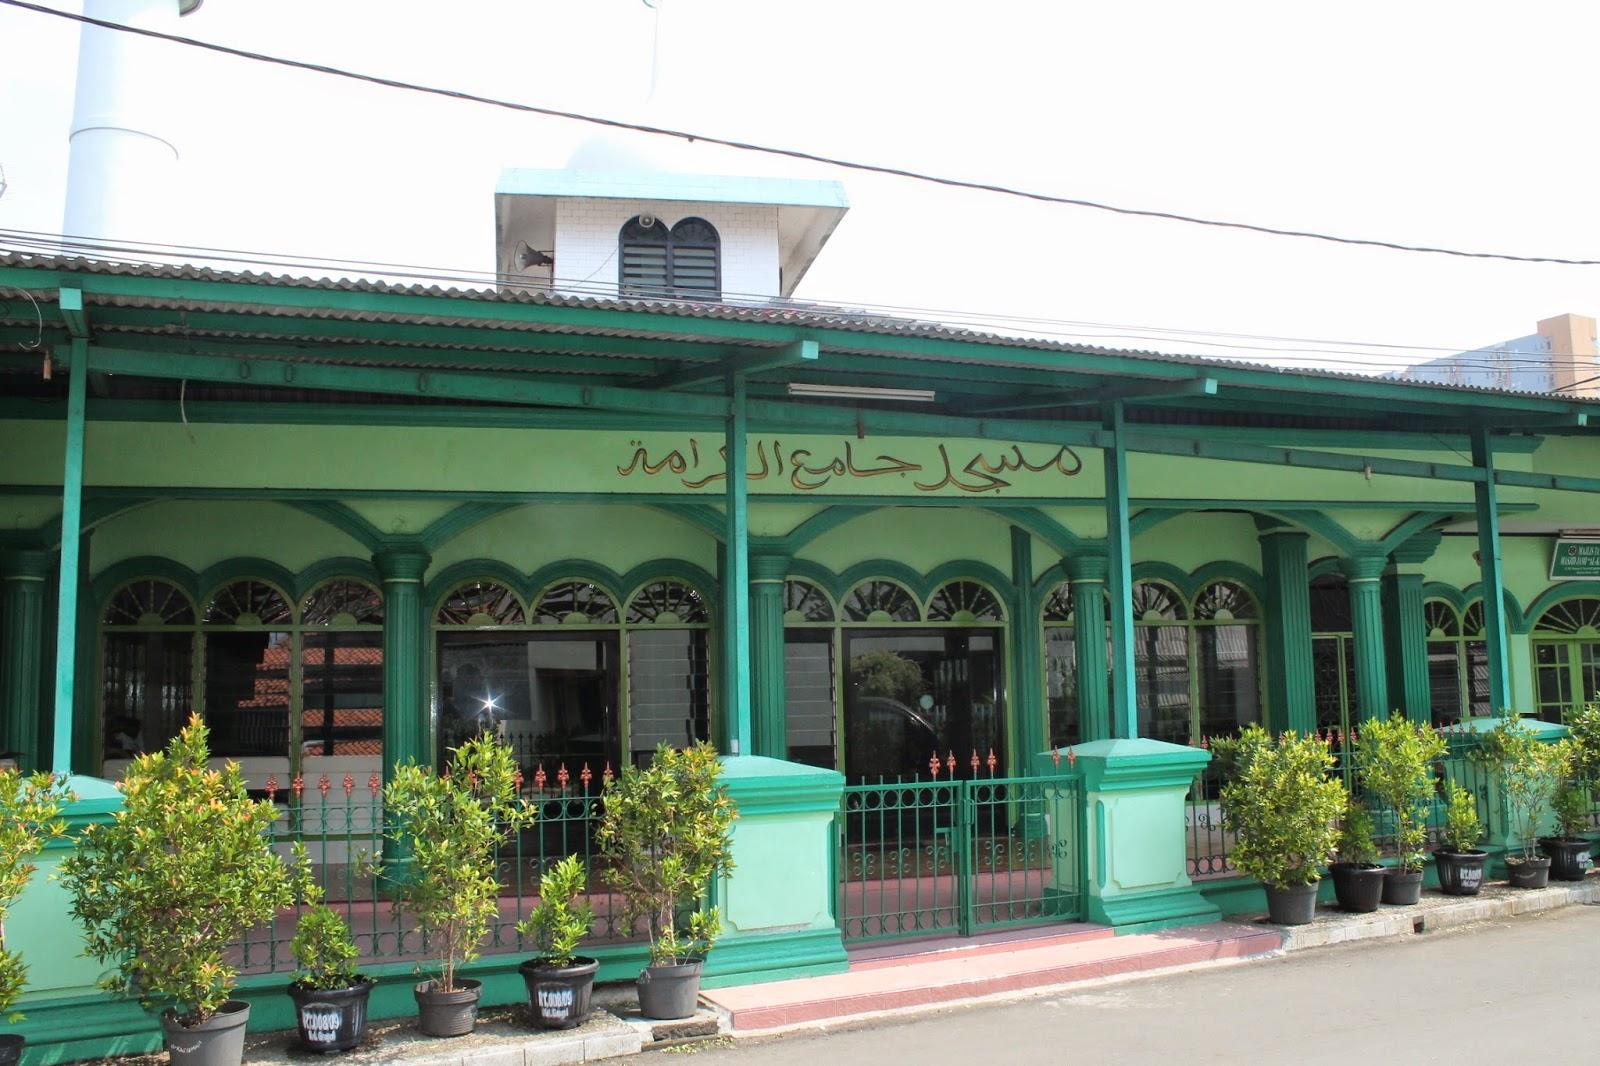 Masjid Jami Alkaromah